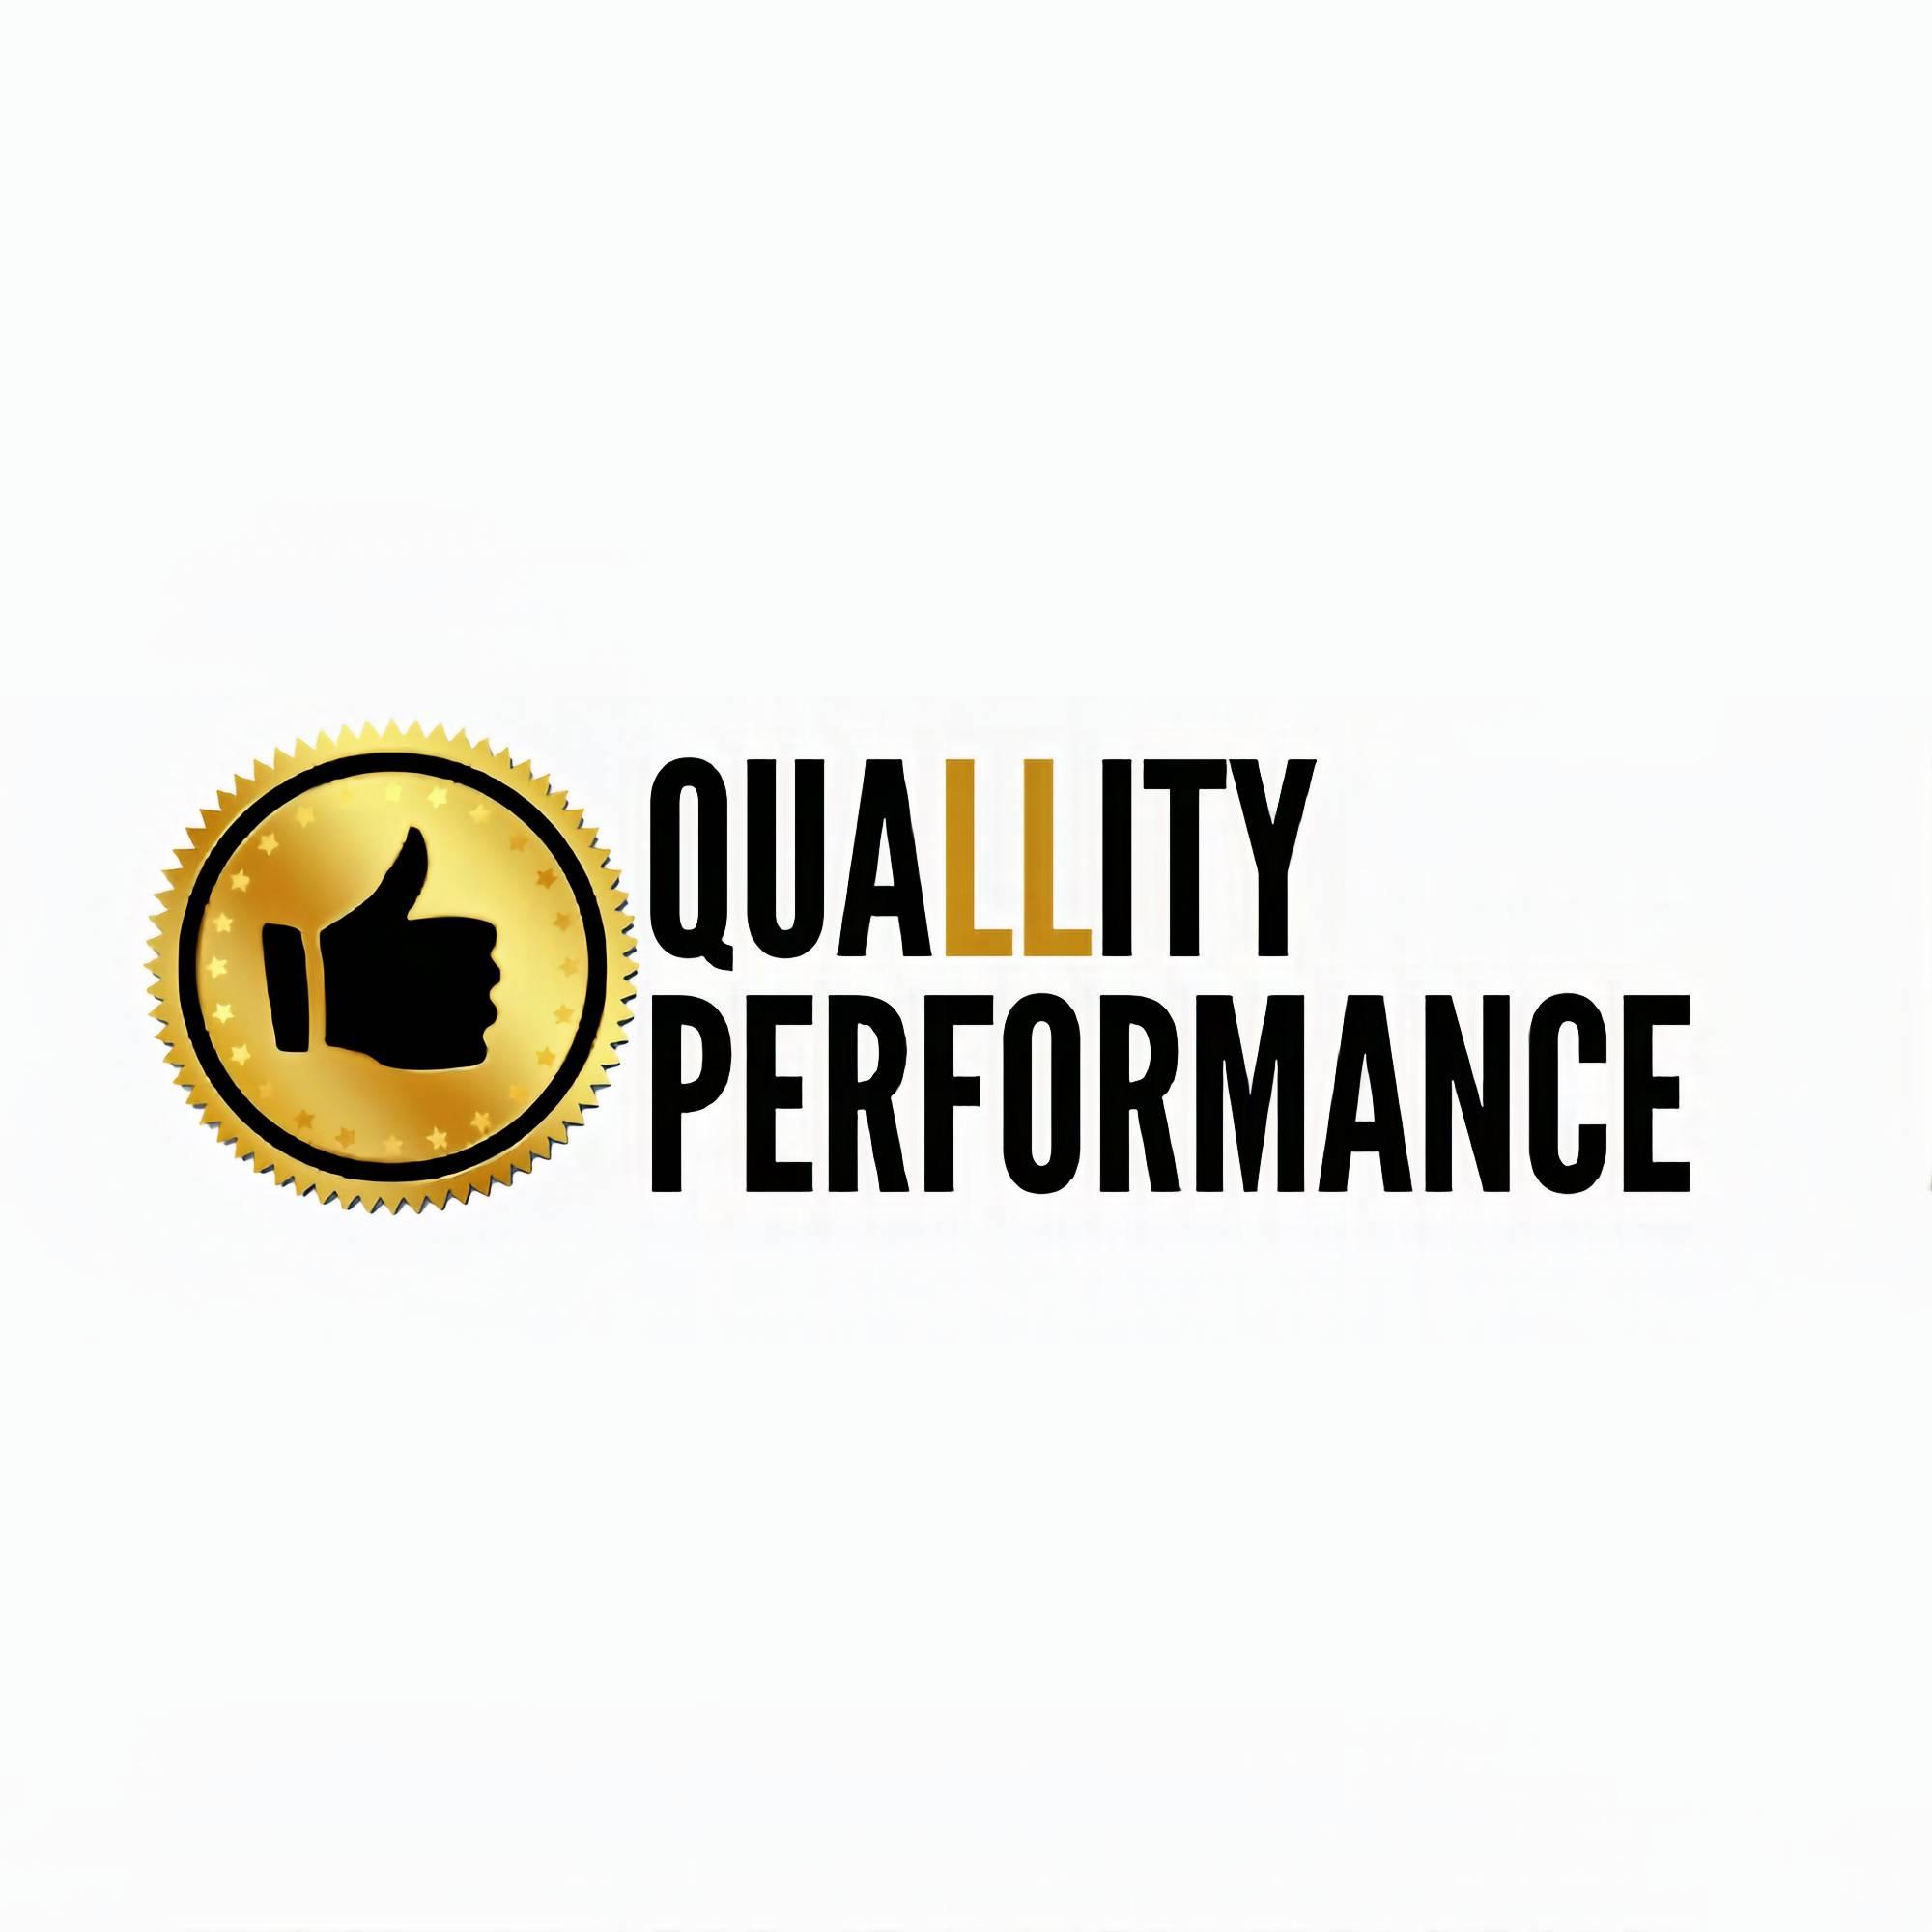 QUALLITY PERFORMANCE